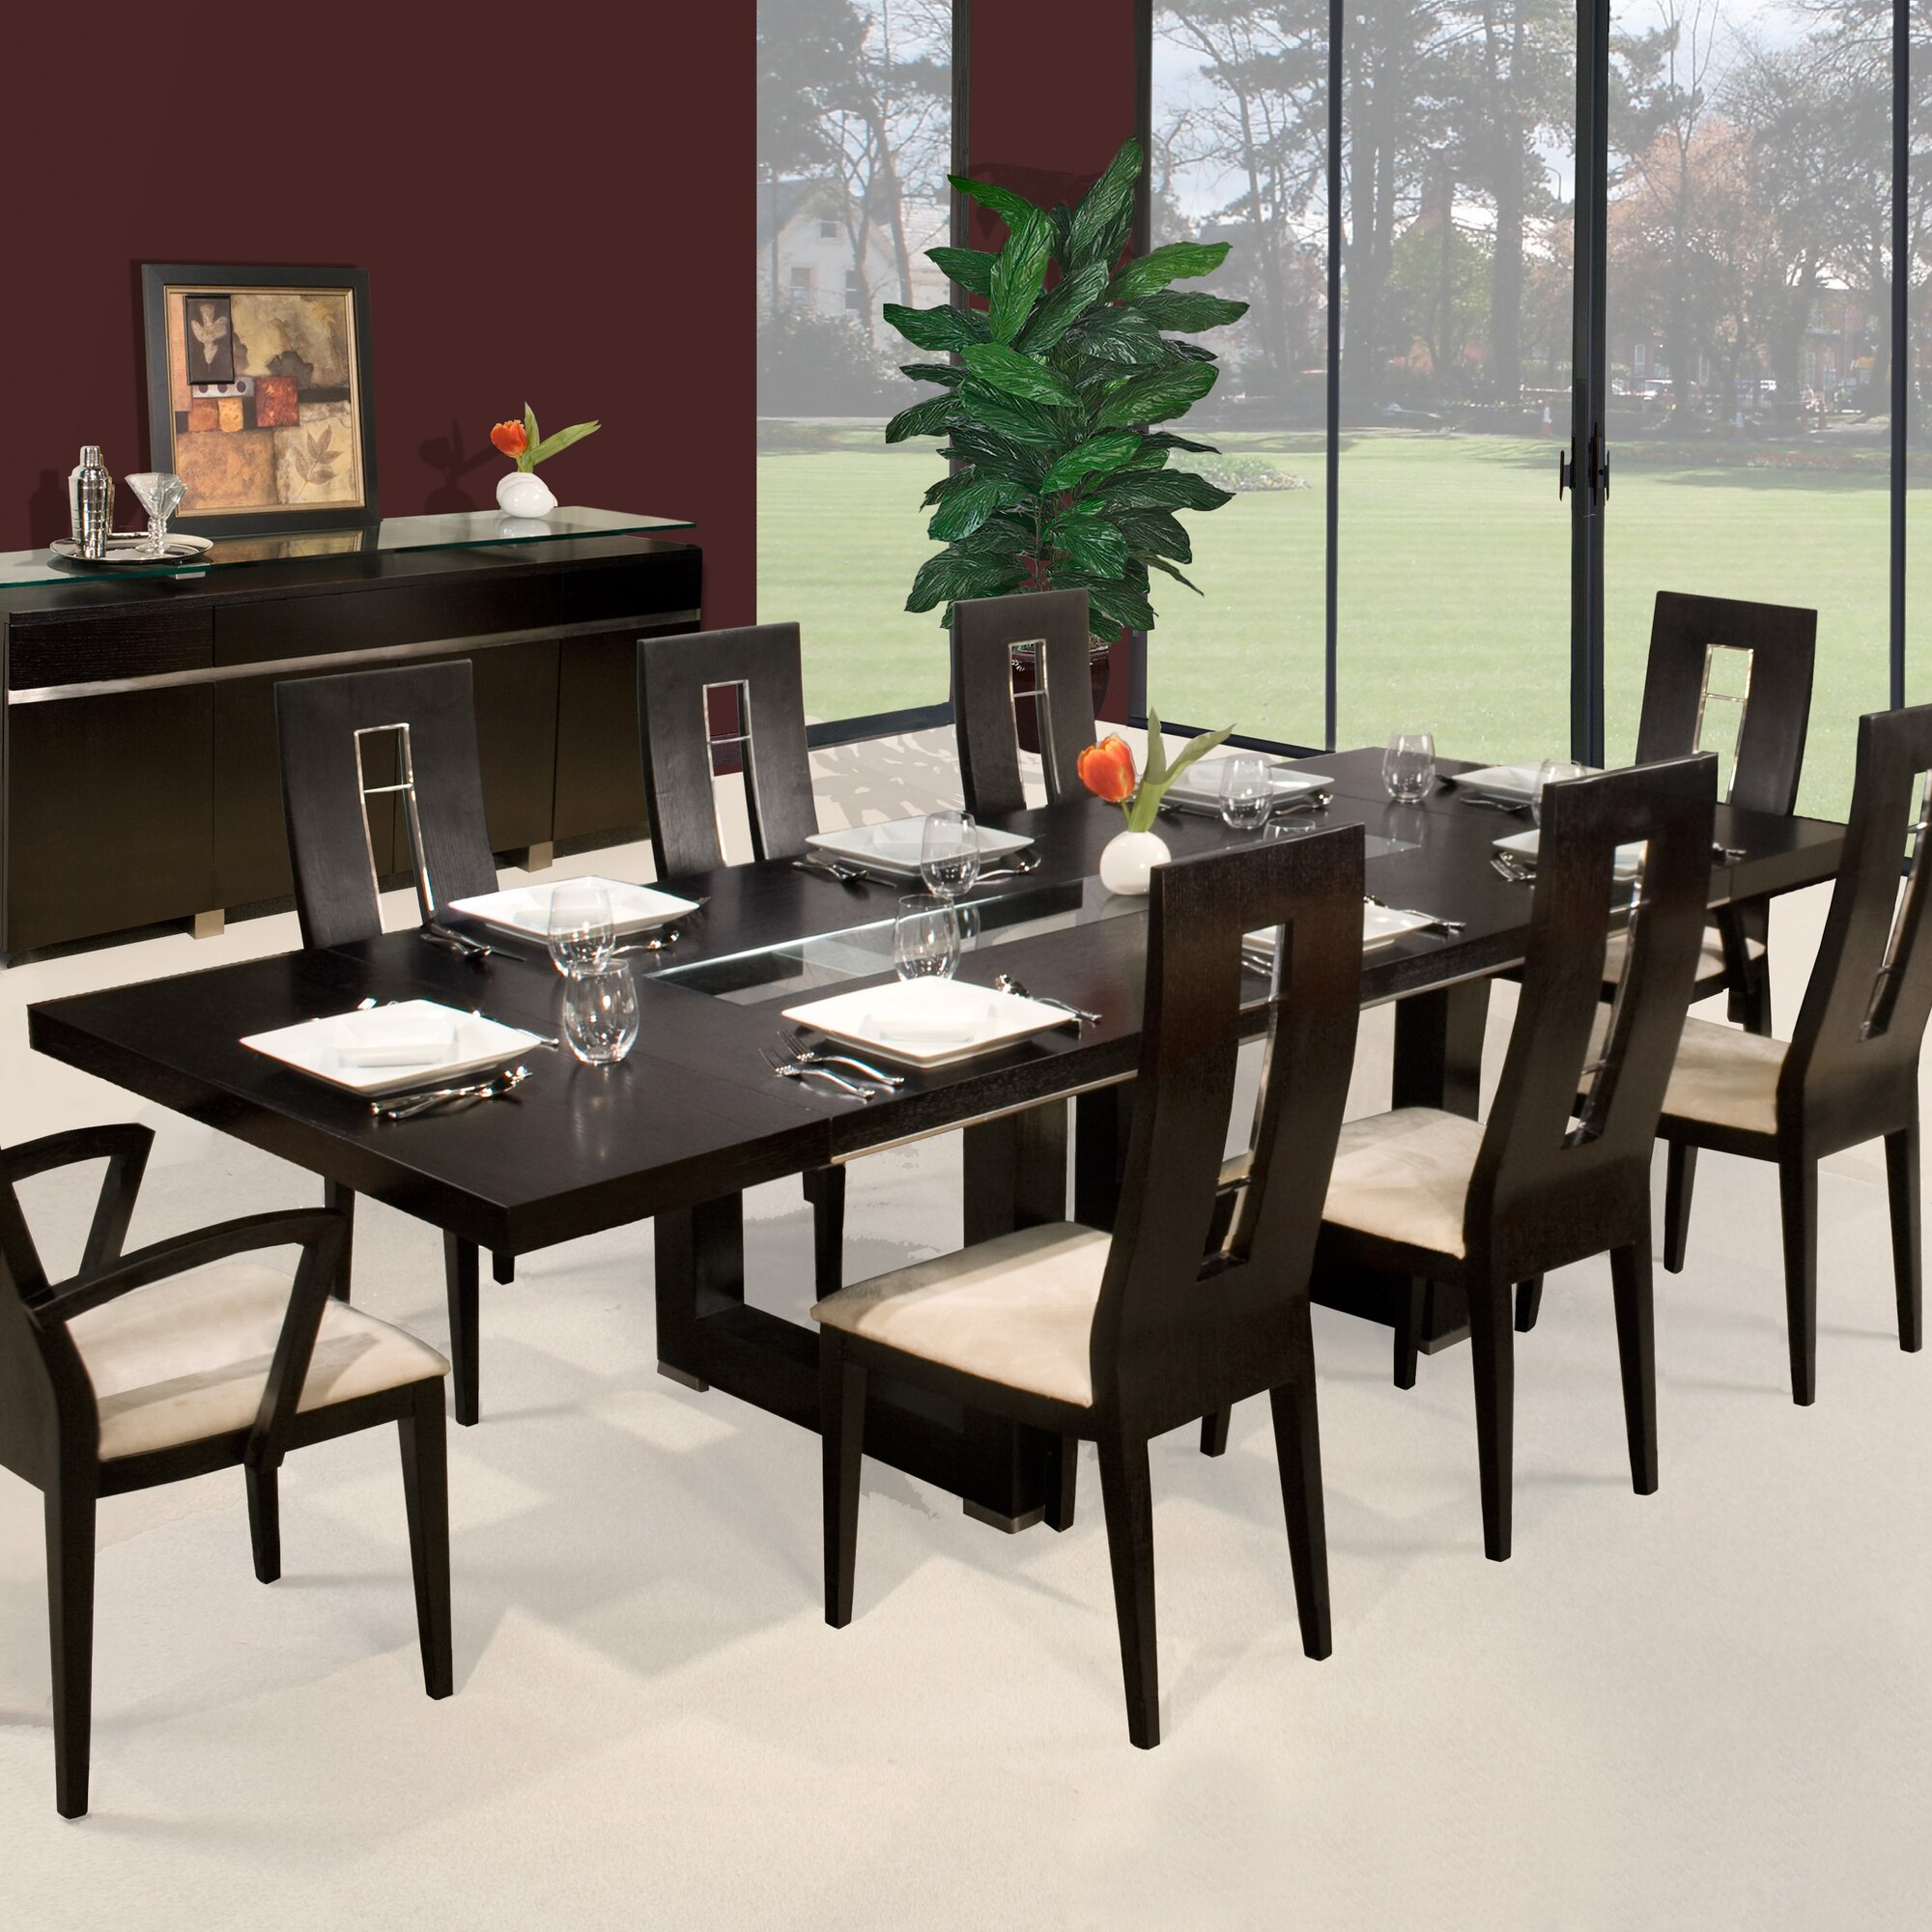 Sharelle Furnishings Novo Dining Table Amp Reviews Wayfair